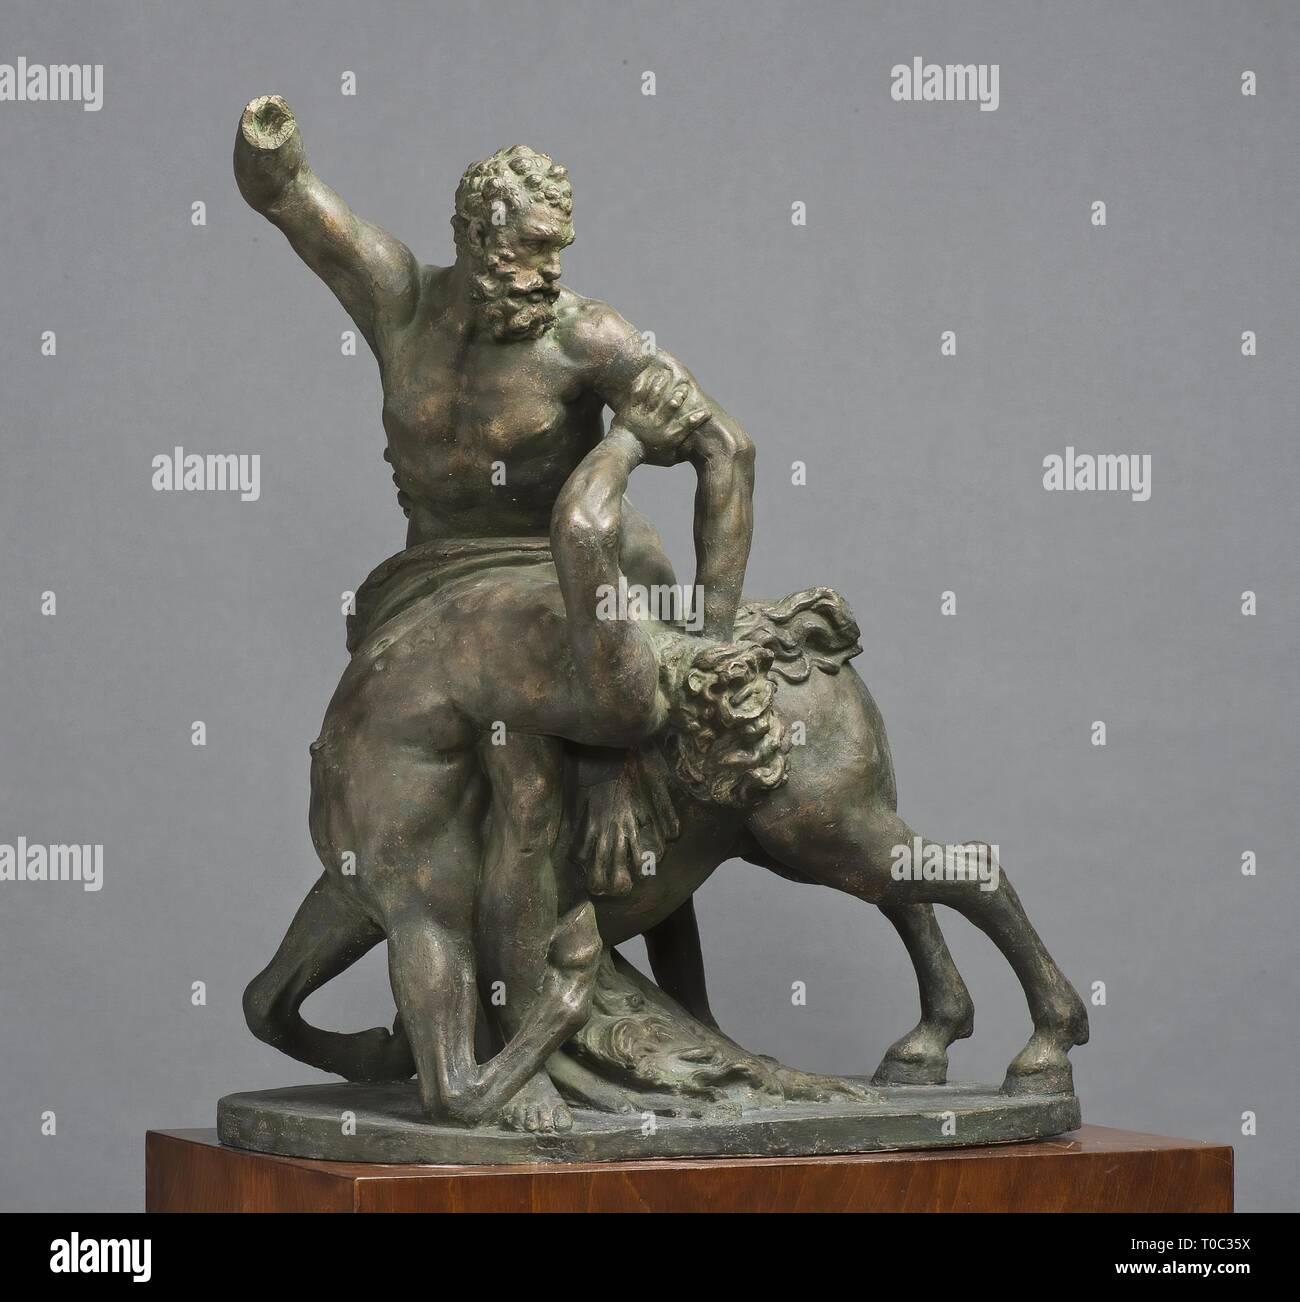 19th Centaur Stock Photos & 19th Centaur Stock Images - Alamy